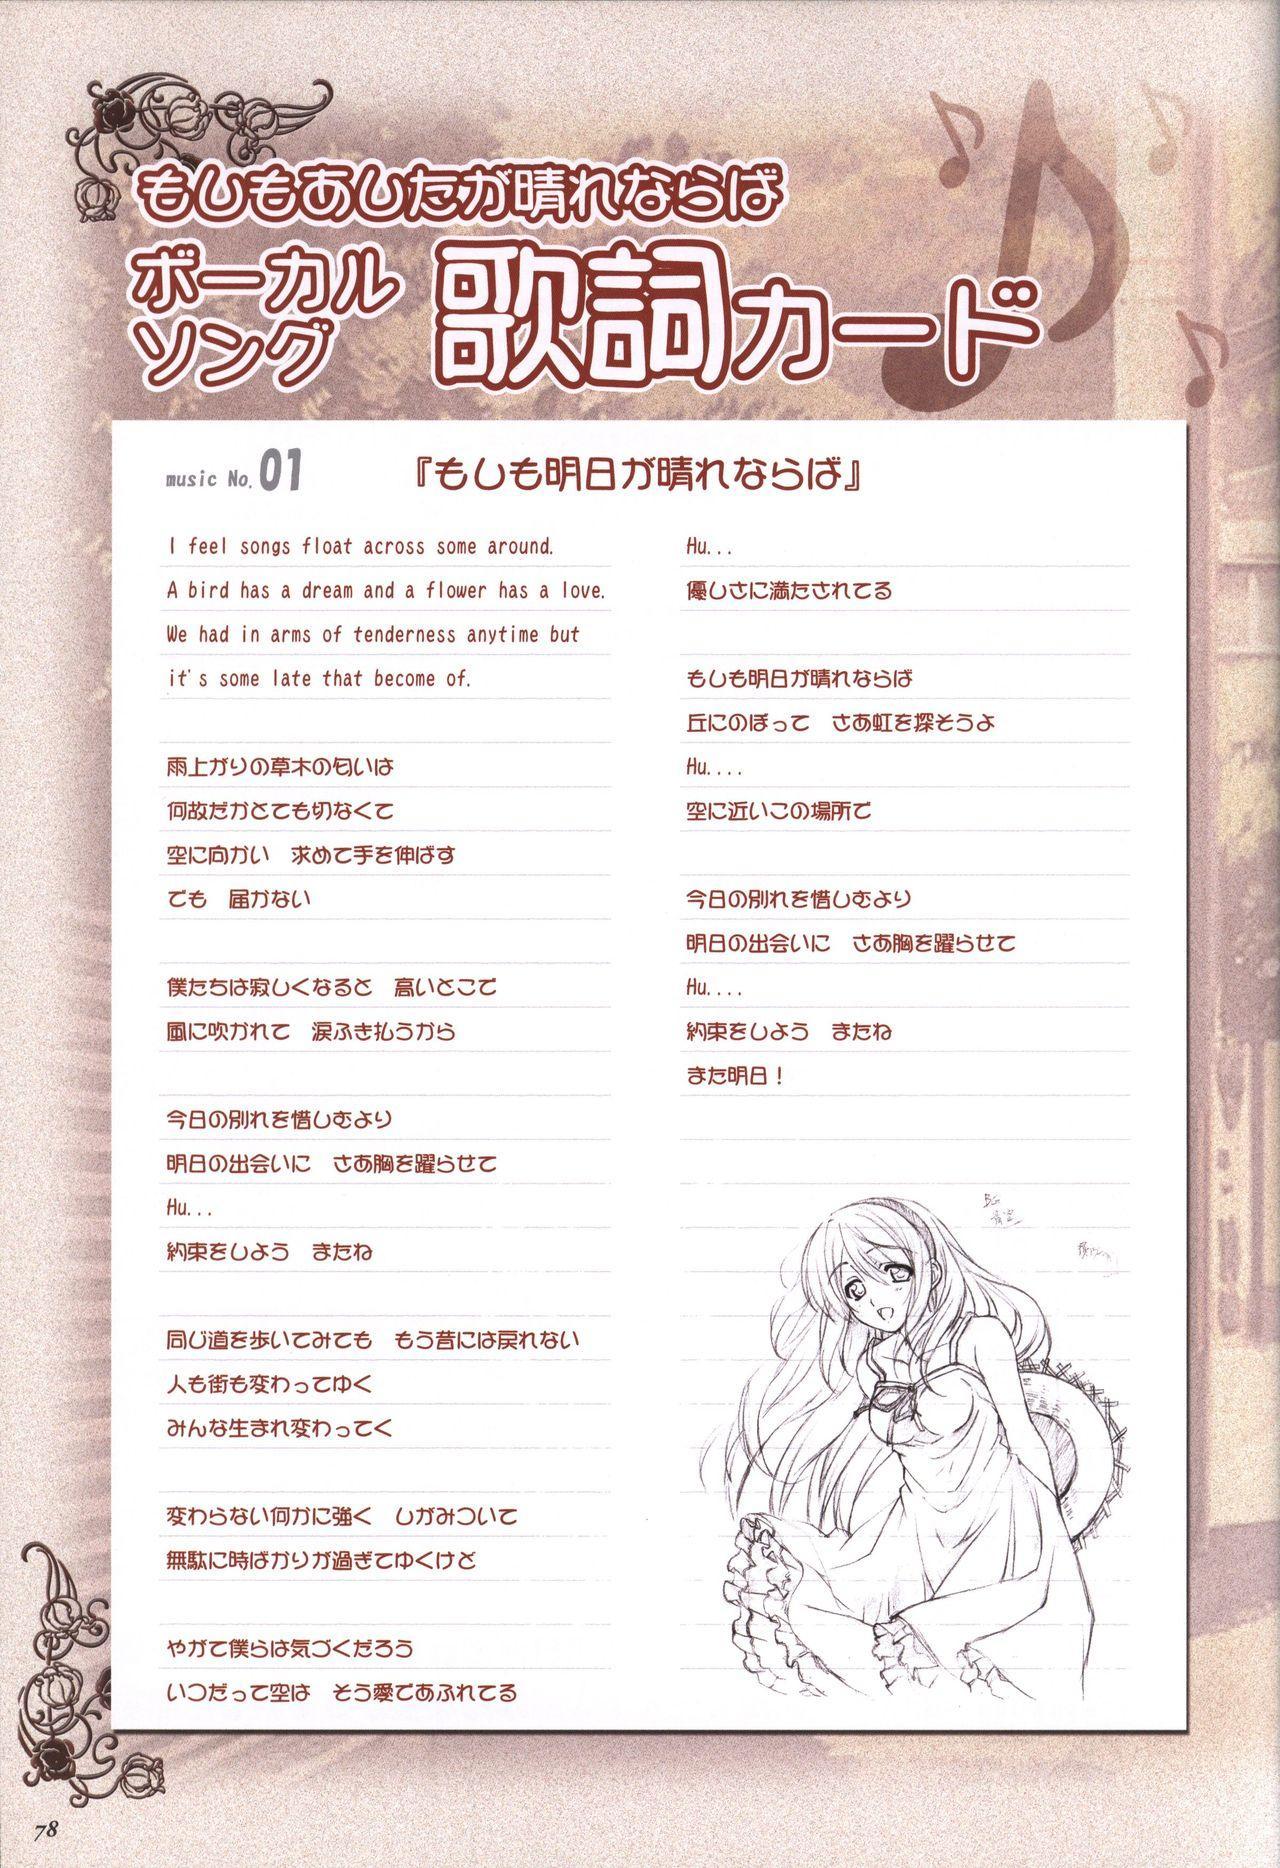 Moshimo Ashita ga Harenaraba official fanbook 78